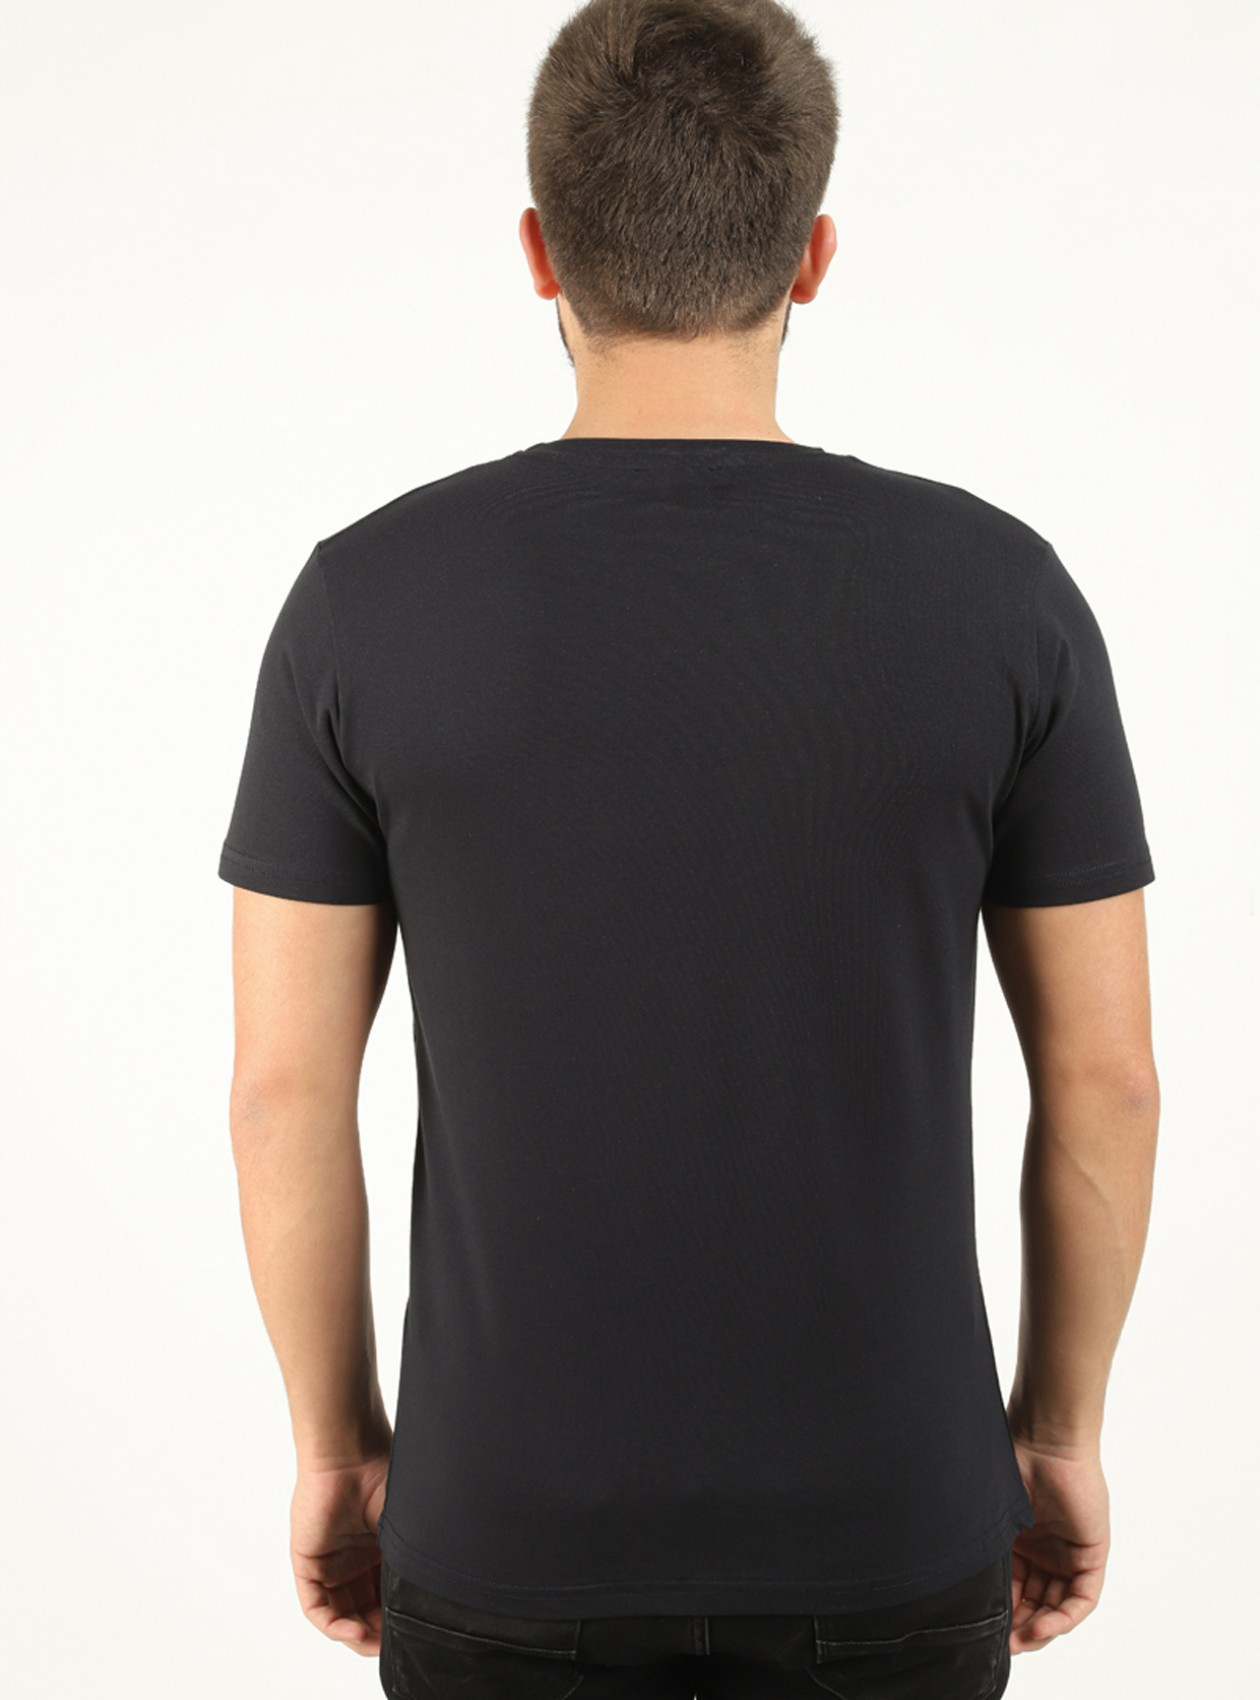 Tee-shirt homme Marine avec bandes contrastantes